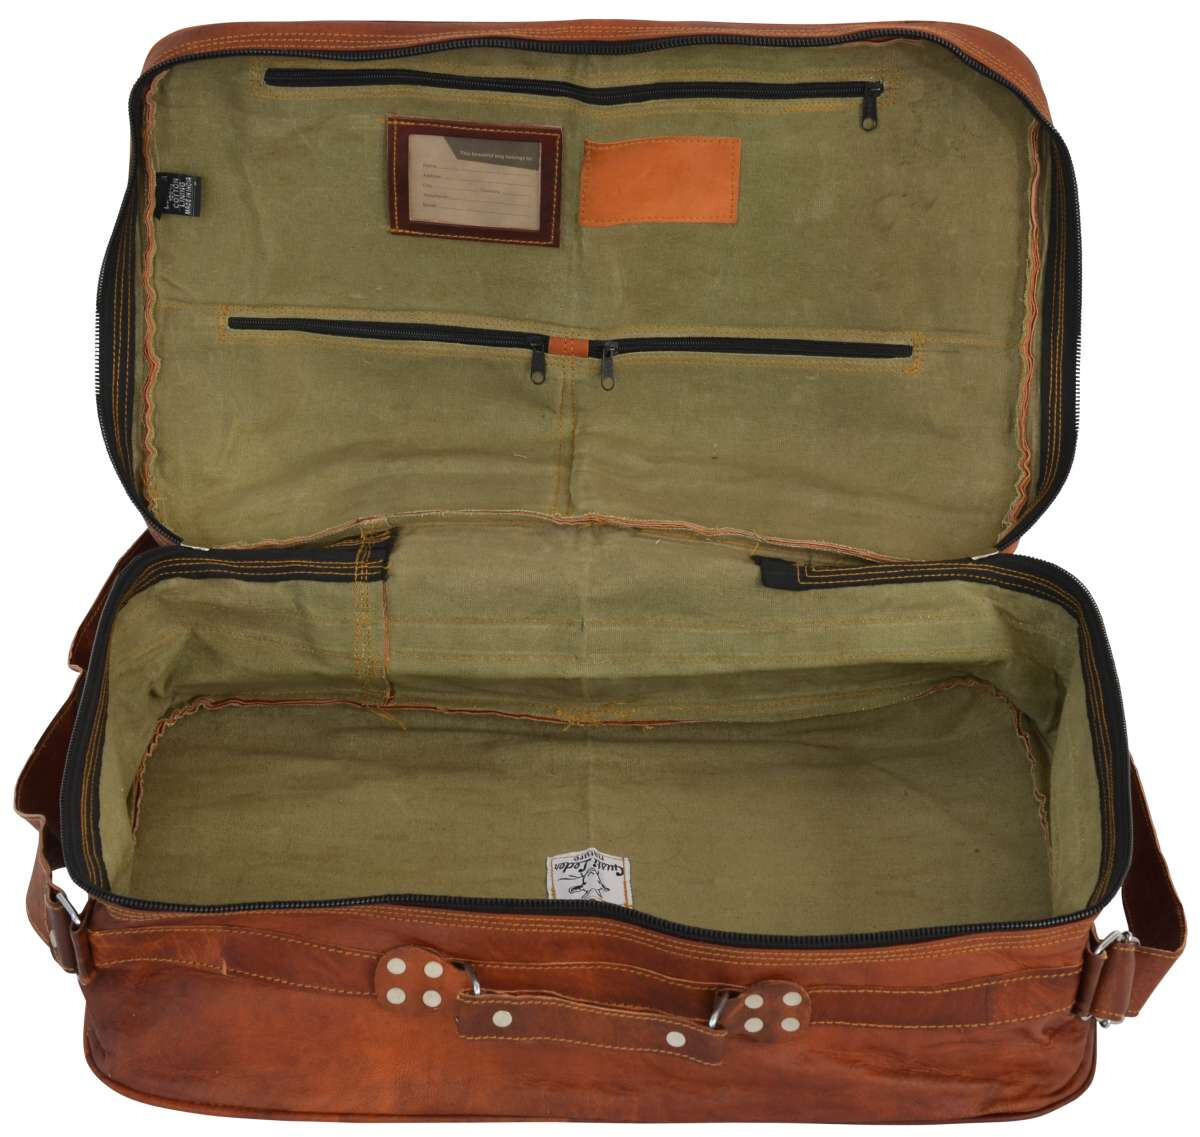 Outlet Reisetasche - Farbunterschiede im Leder - kleinere Lederfehler - faltiges Leder – ansonsten n